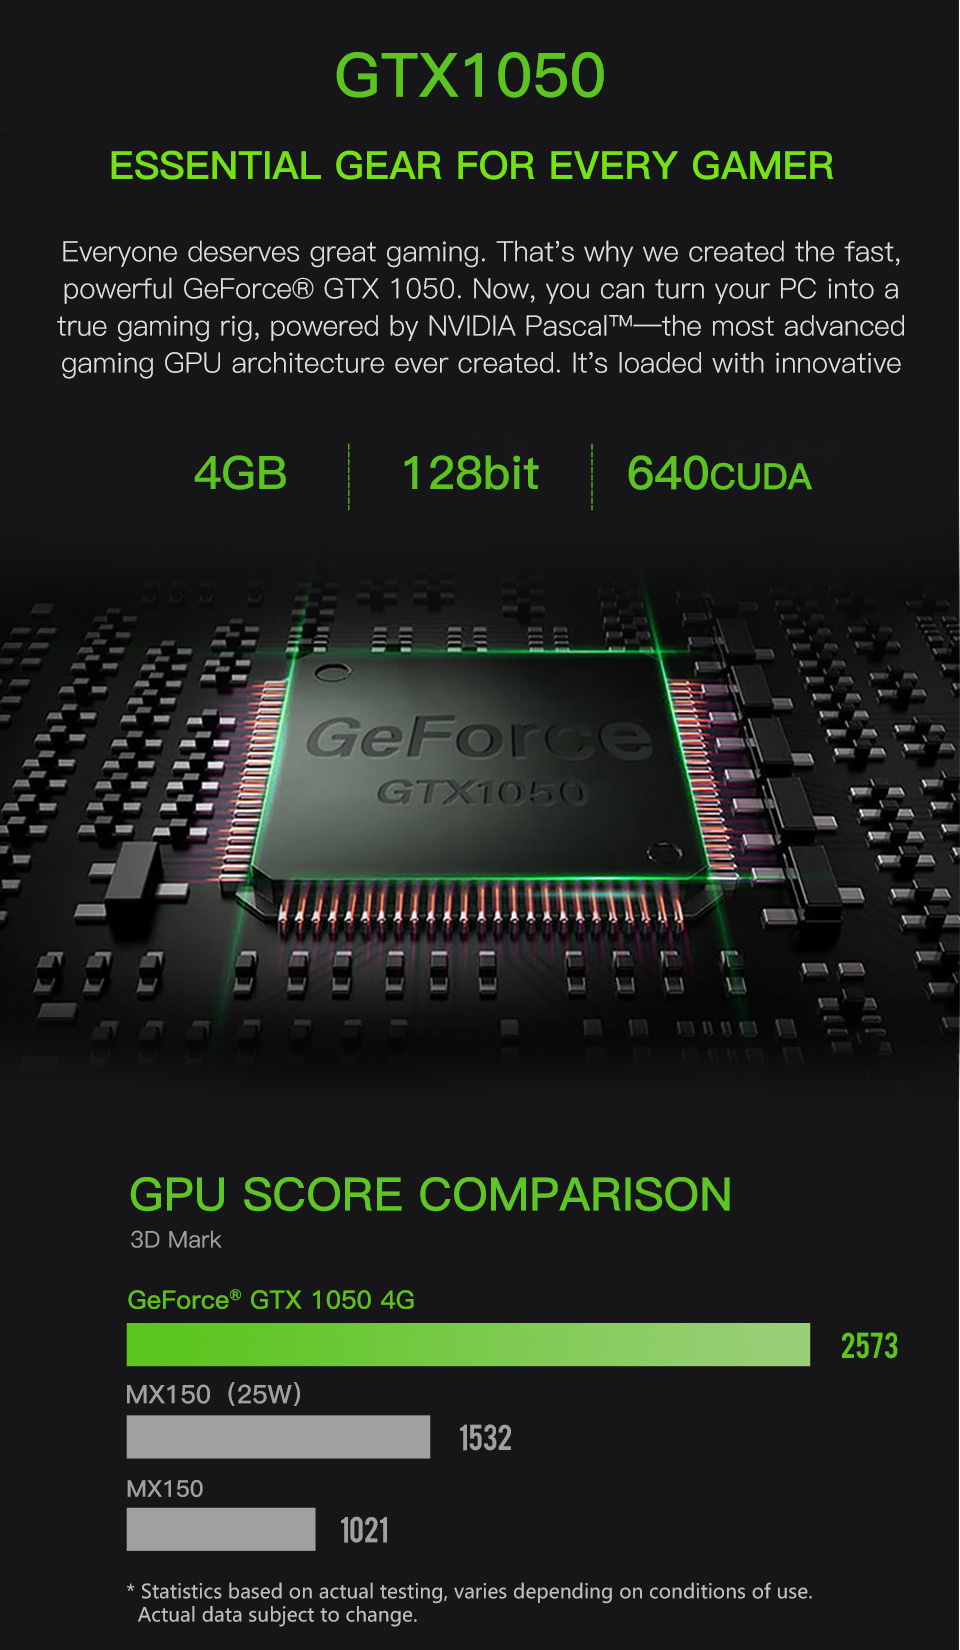 H28b13e1ea9f14ad48146b8c1747fe0c1D Hasee K670D-G4E6 Laptop for Gaming (Intel 9Gen G5420+GTX1050 4G/8G RAM/256G SSD/15.6'' IPS)Hasee desktop-grade notebook